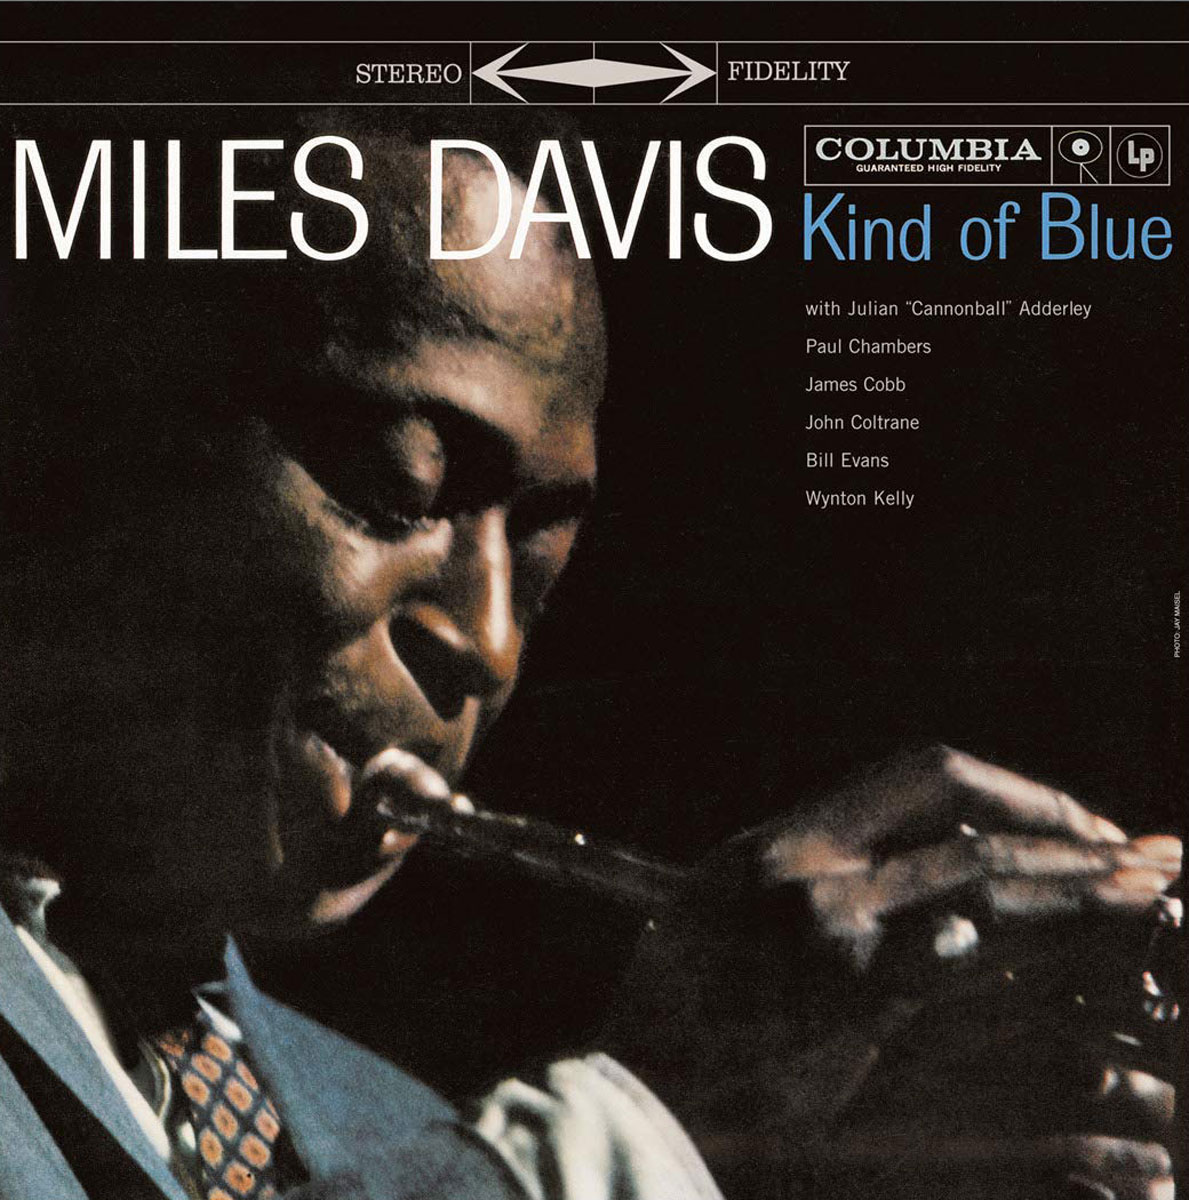 Майлз Дэвис,Джон Колтрейн,Уинтон Келли,Билл Эванс,Джимми Кобб Miles Davis. Kind Of Blue (LP) майлз дэвис miles davis someday my prince will come lp